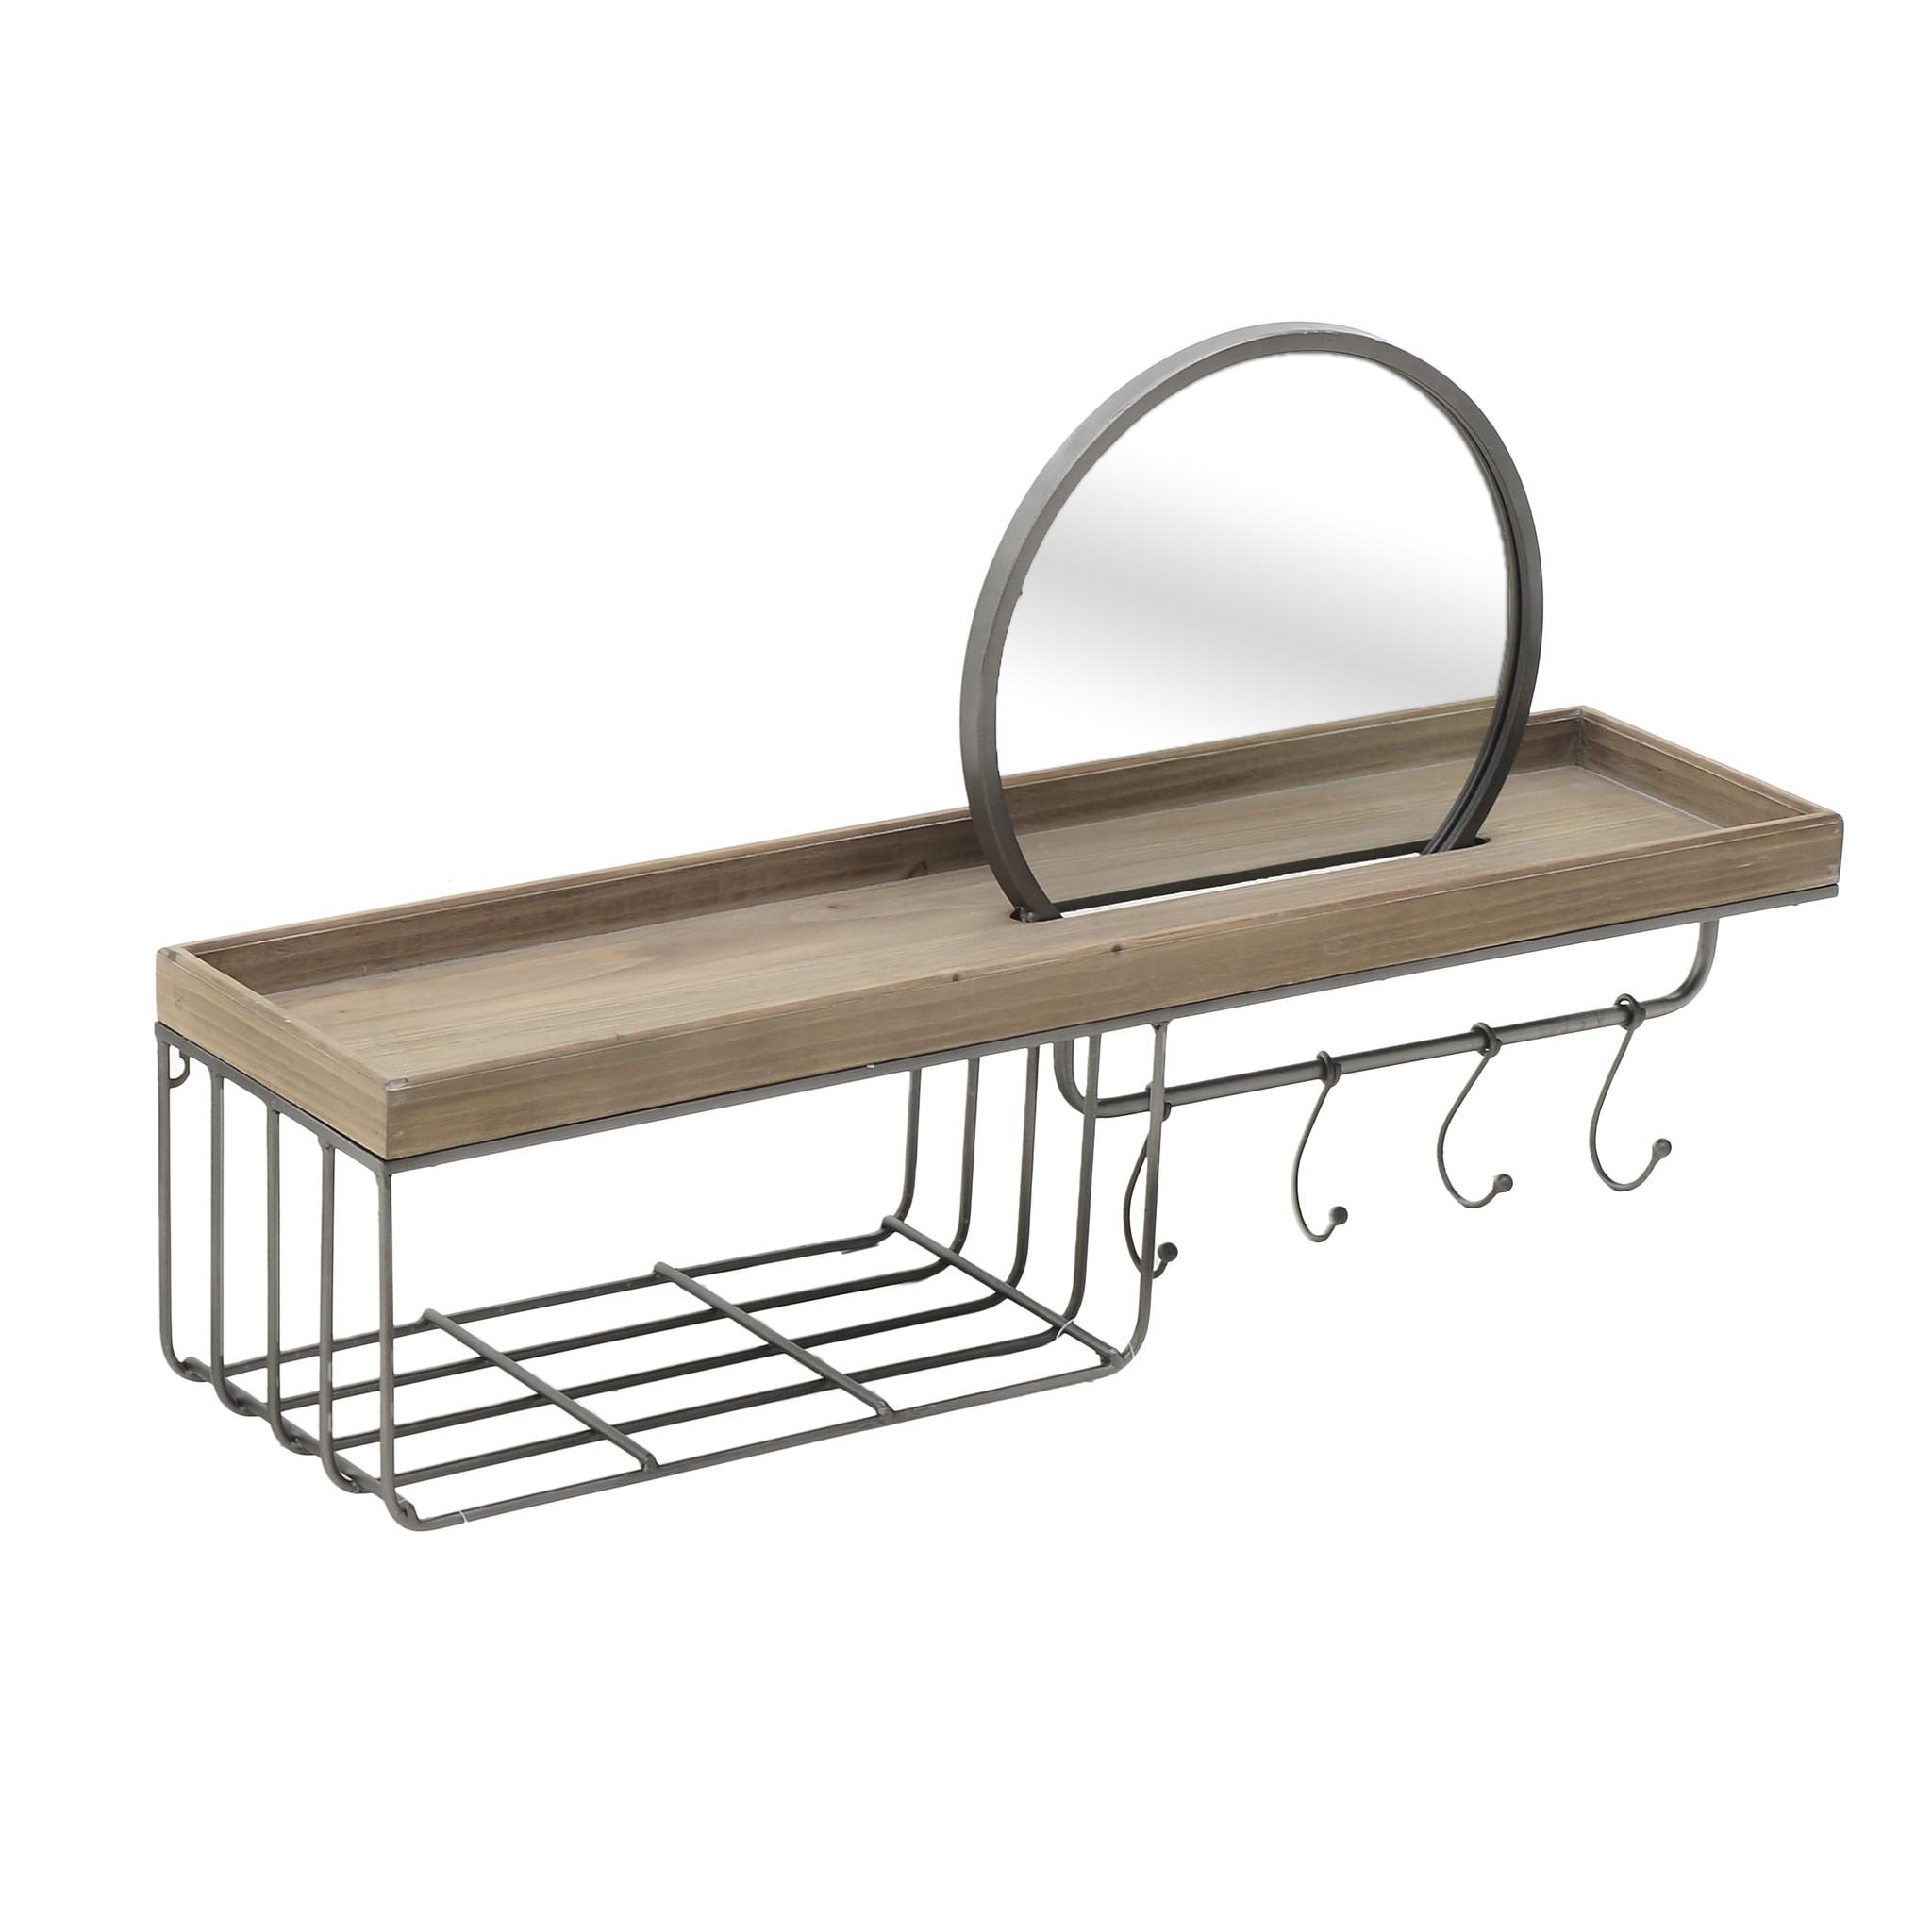 Полка с крючками из металла и дерева